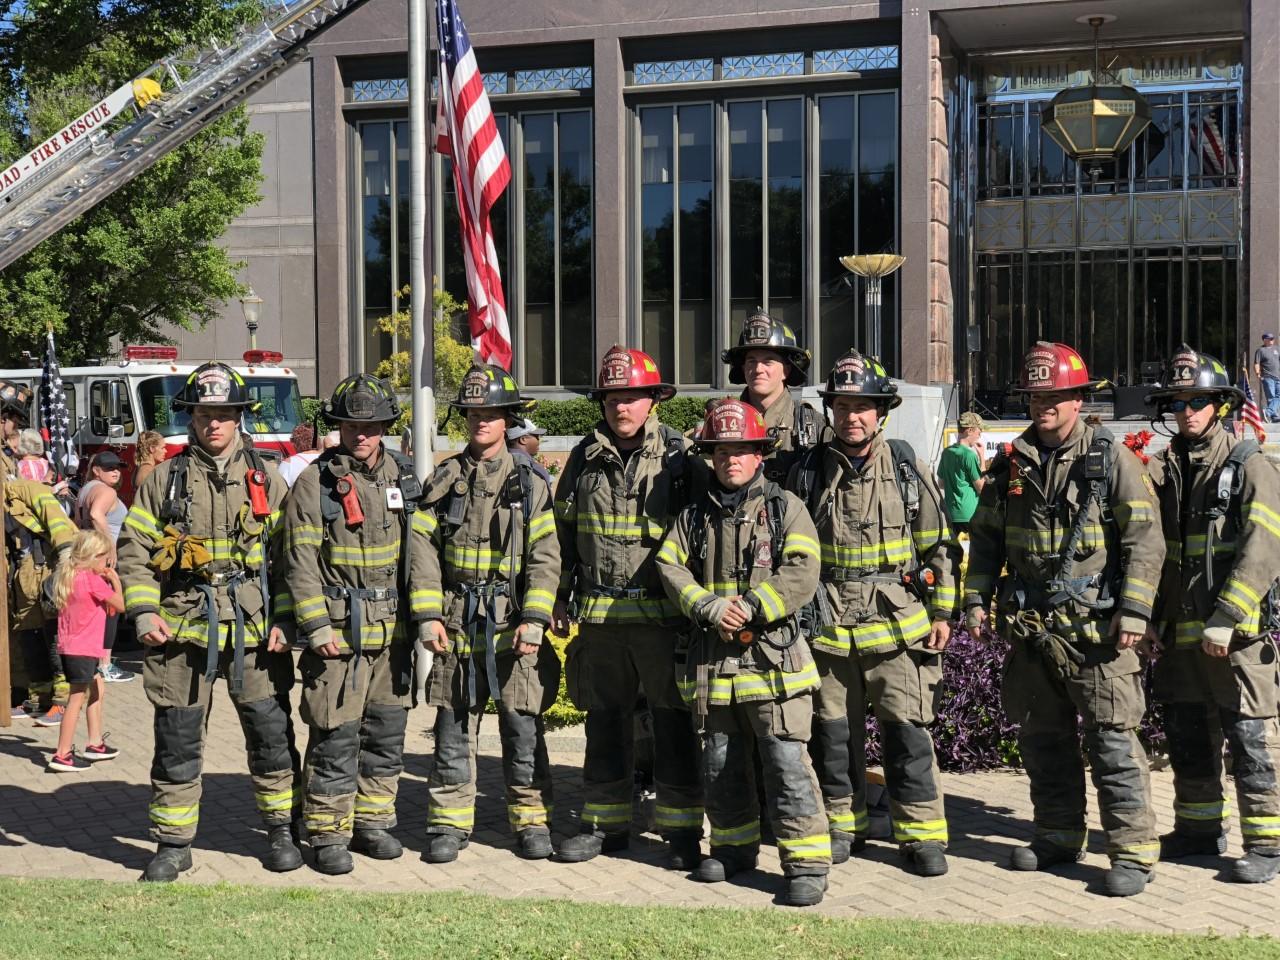 Birmingham Fire Dept at Memorial Stair Climb